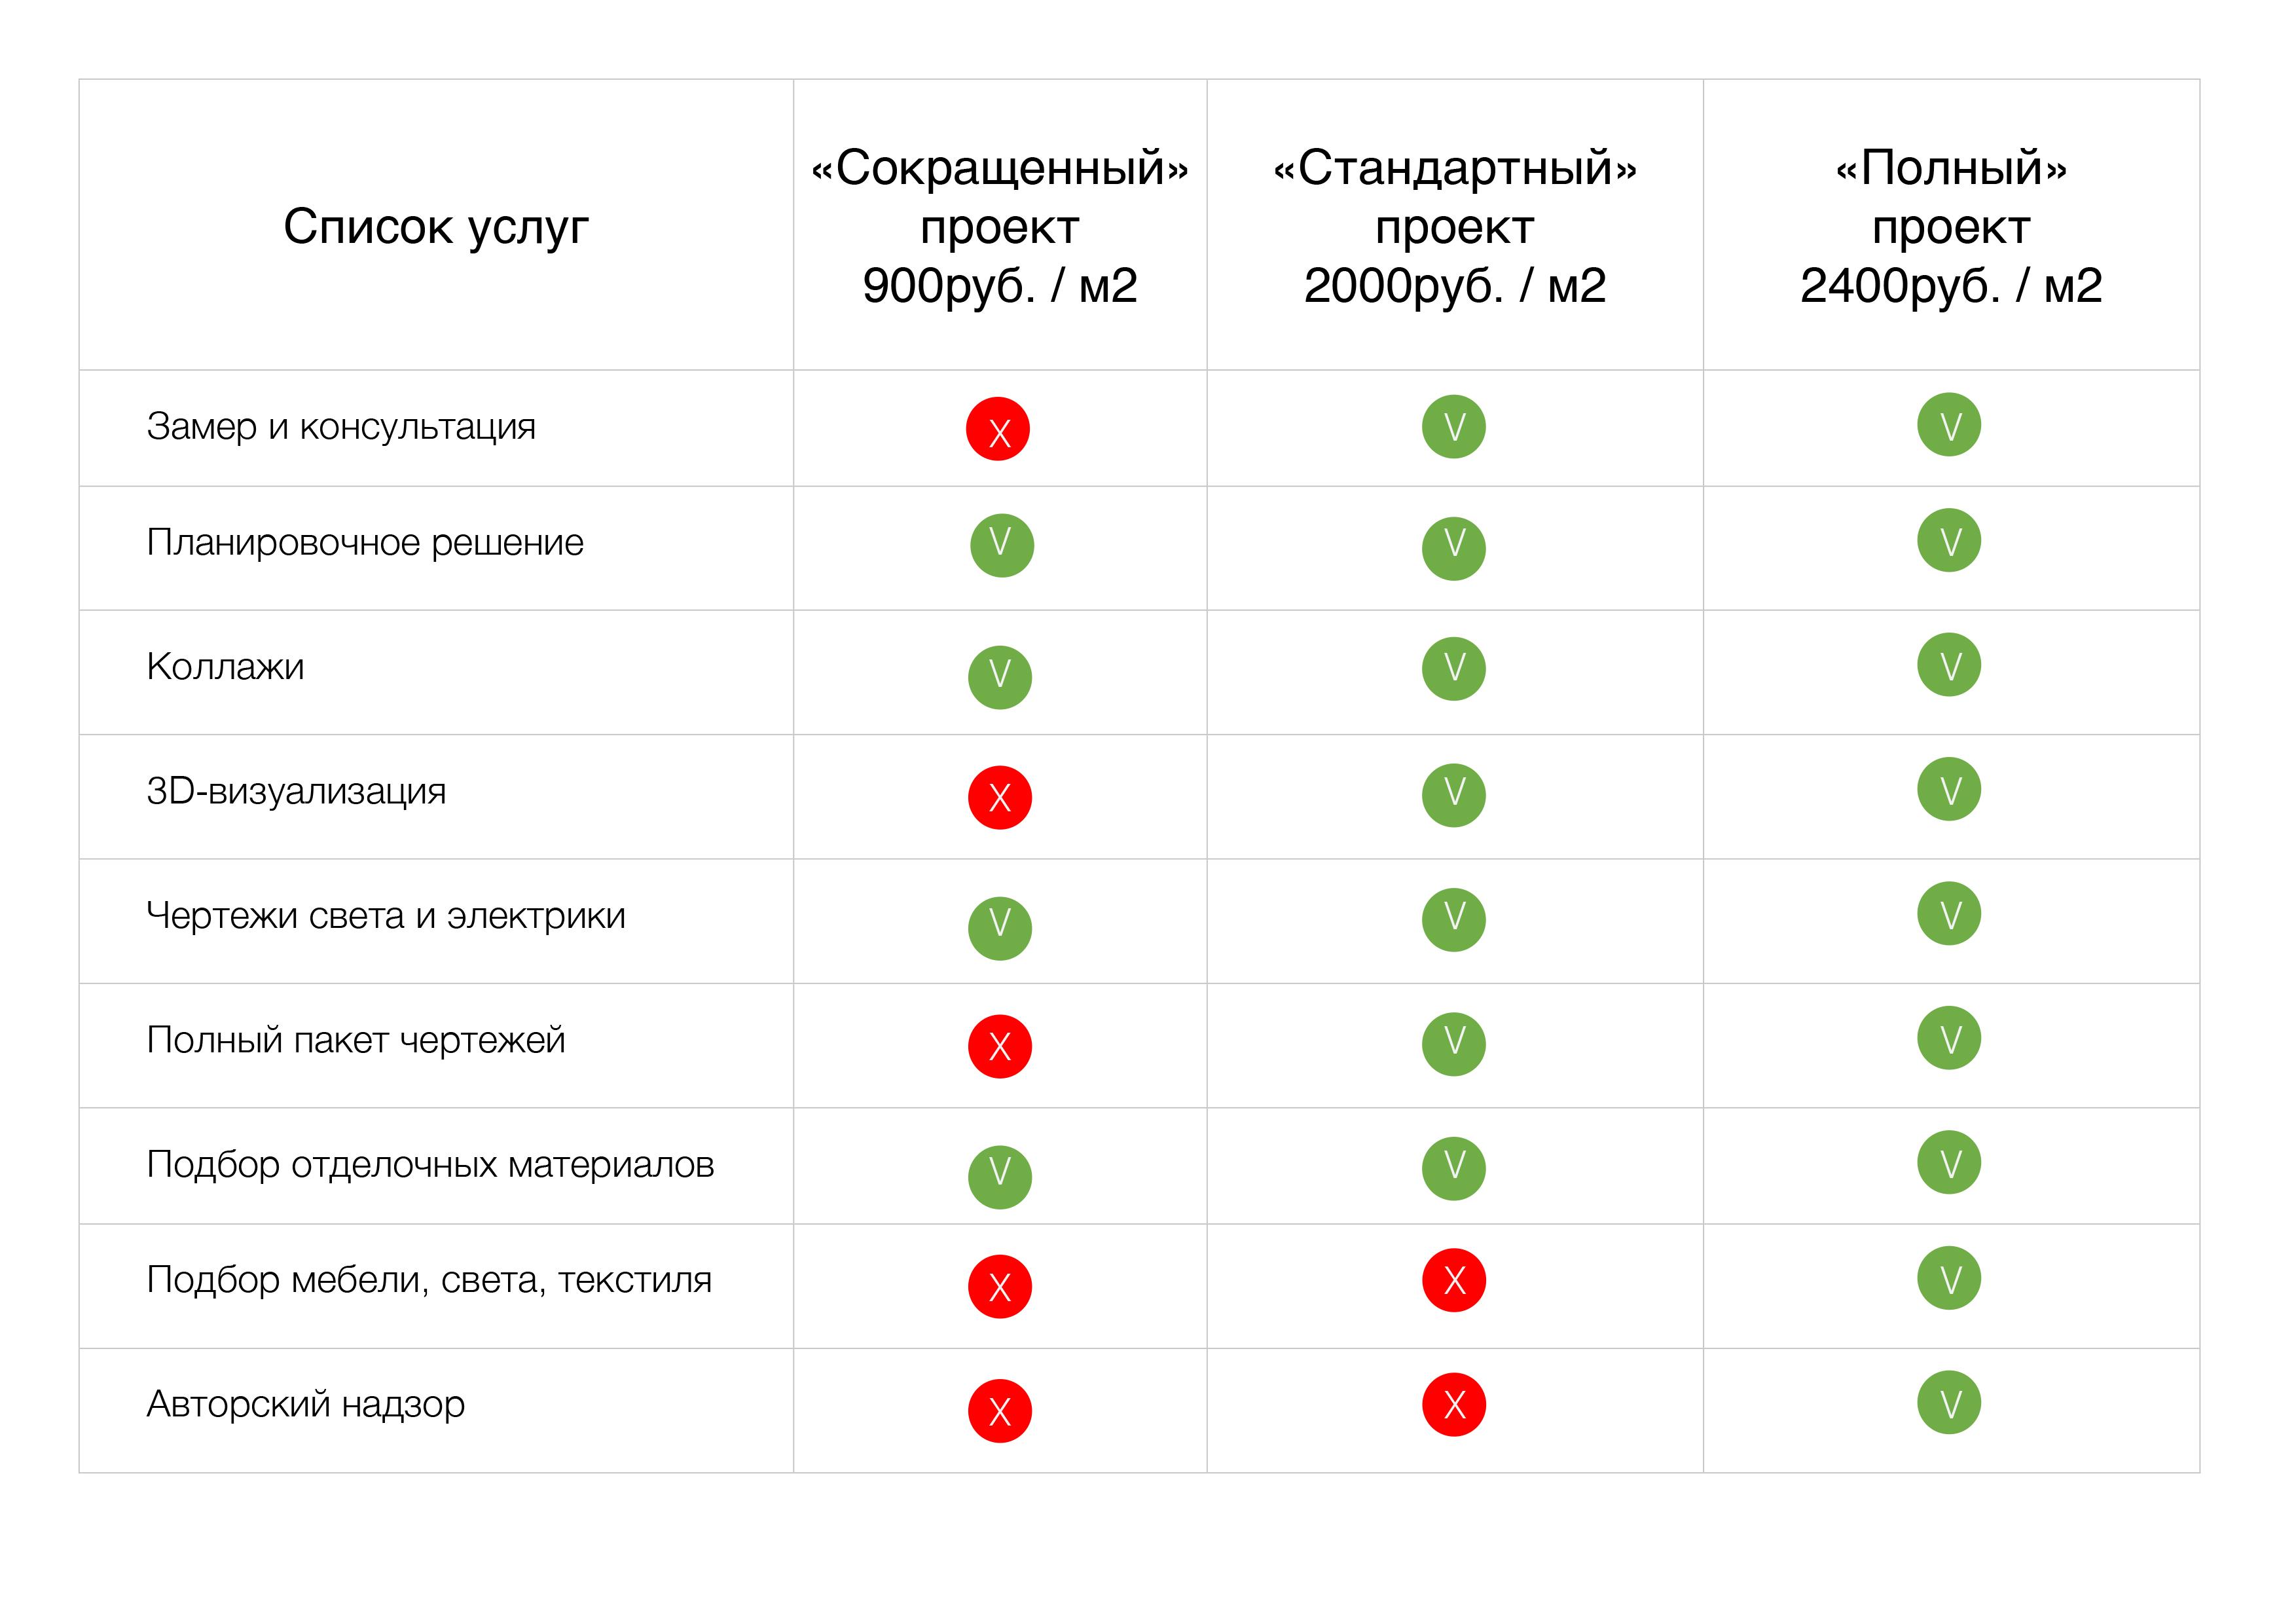 Microsoft Word - Список услуг.docx